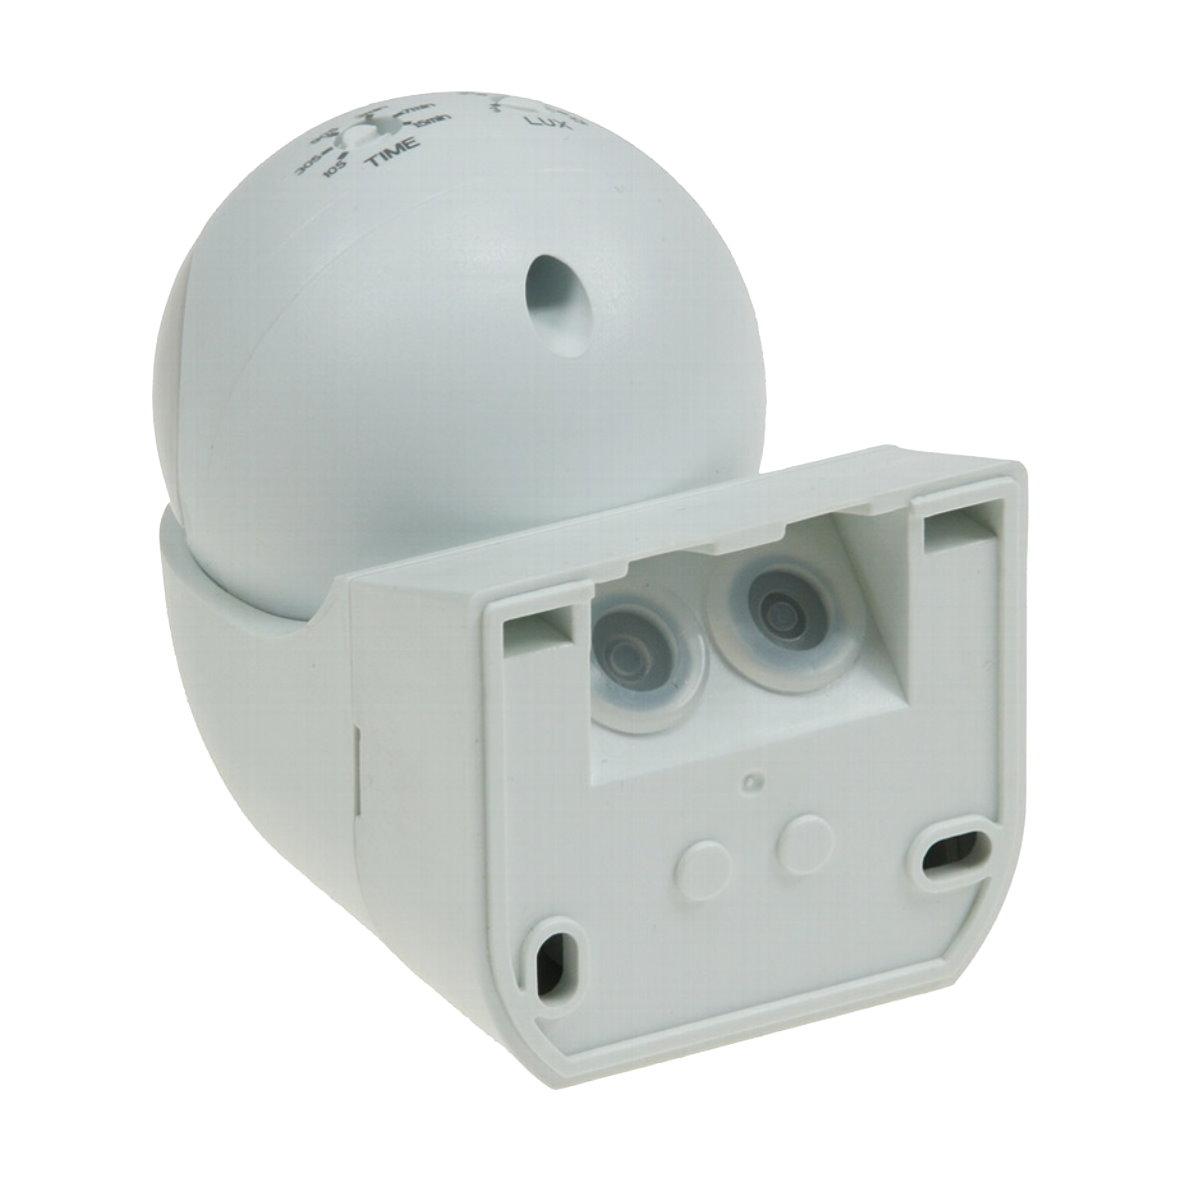 aussen bewegungsmelder sensor 180 ip44 led geeignet 1 800w max 12m 230v ebay. Black Bedroom Furniture Sets. Home Design Ideas